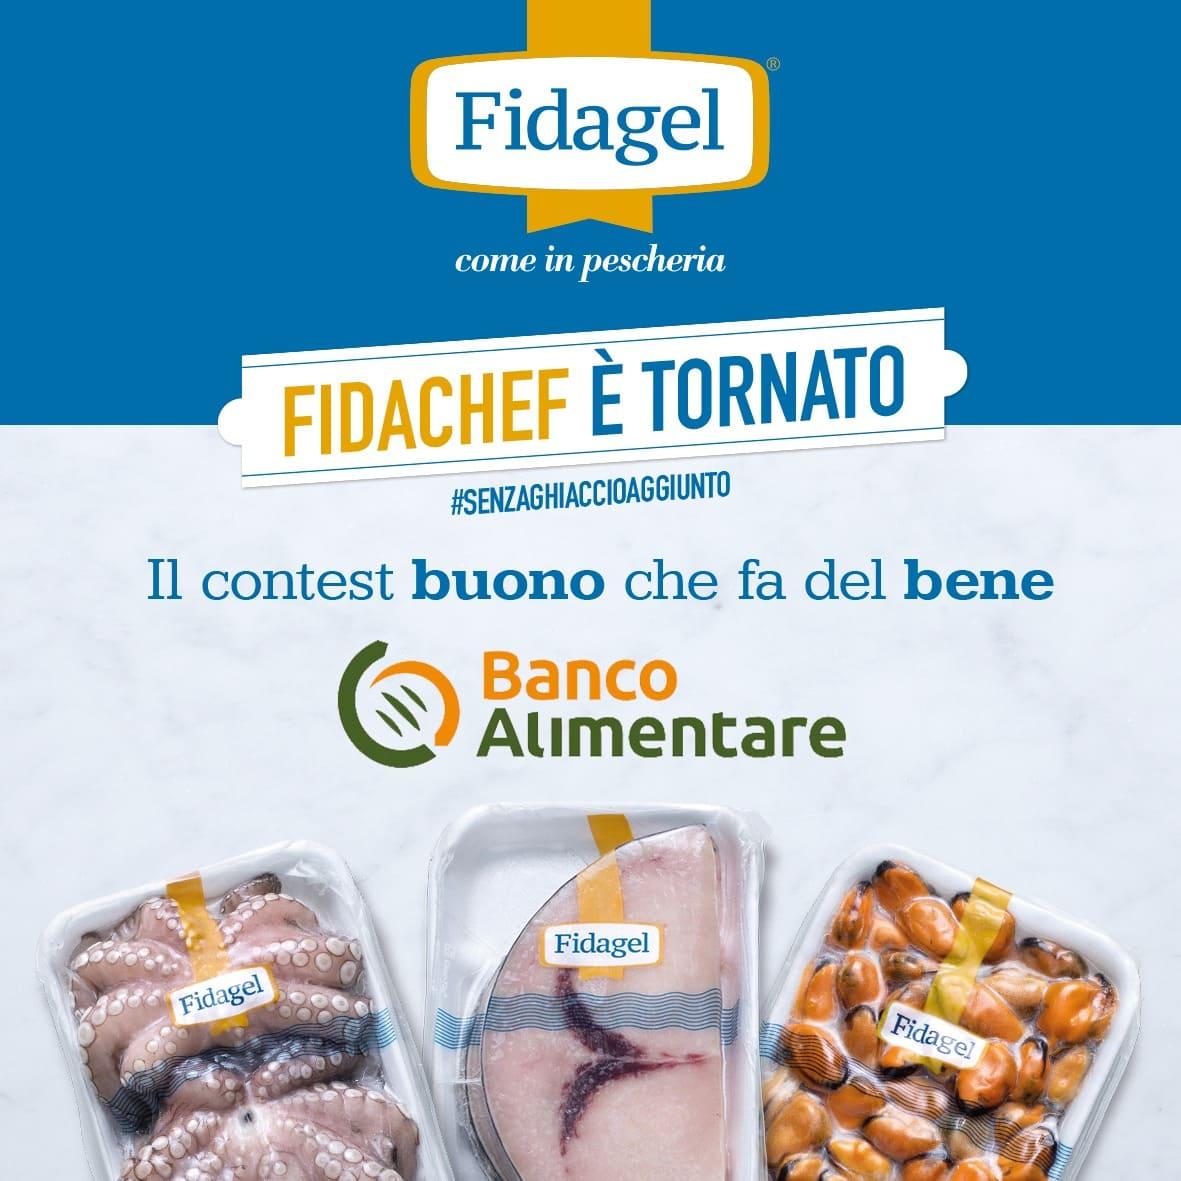 Fidachef